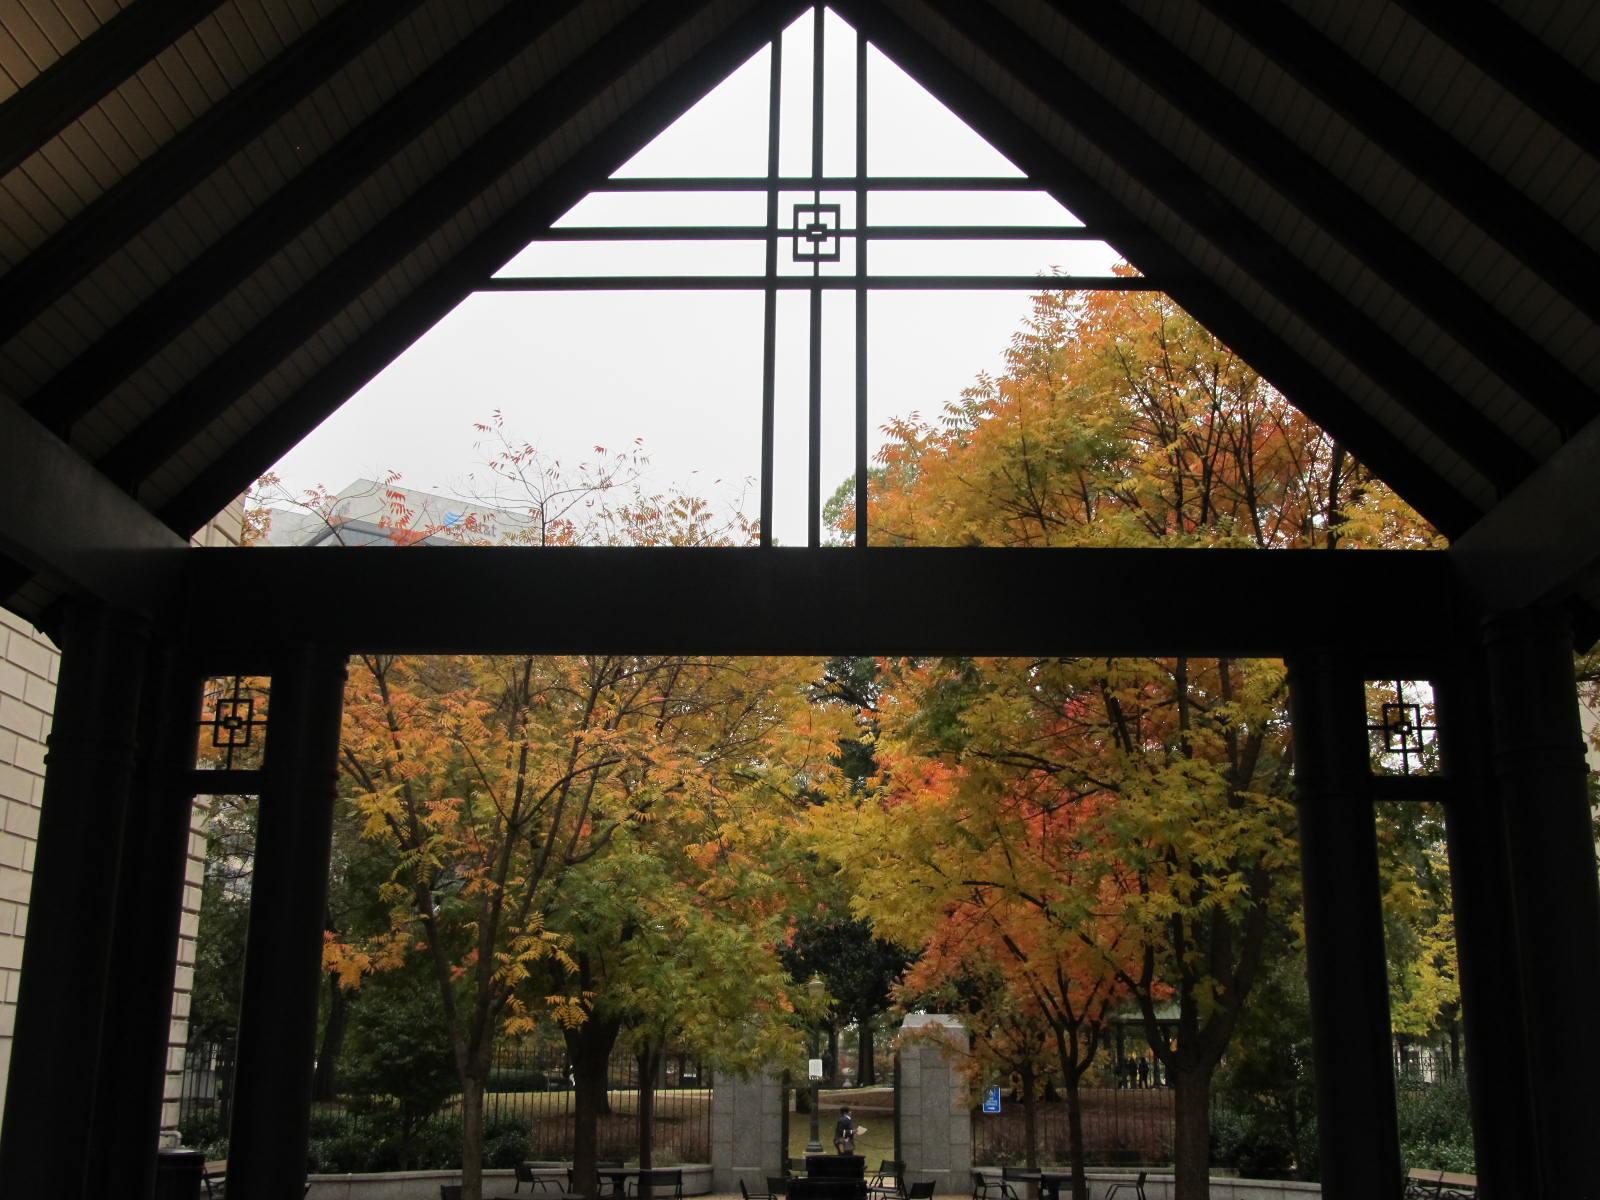 Autumn Trees from Gazebo Window